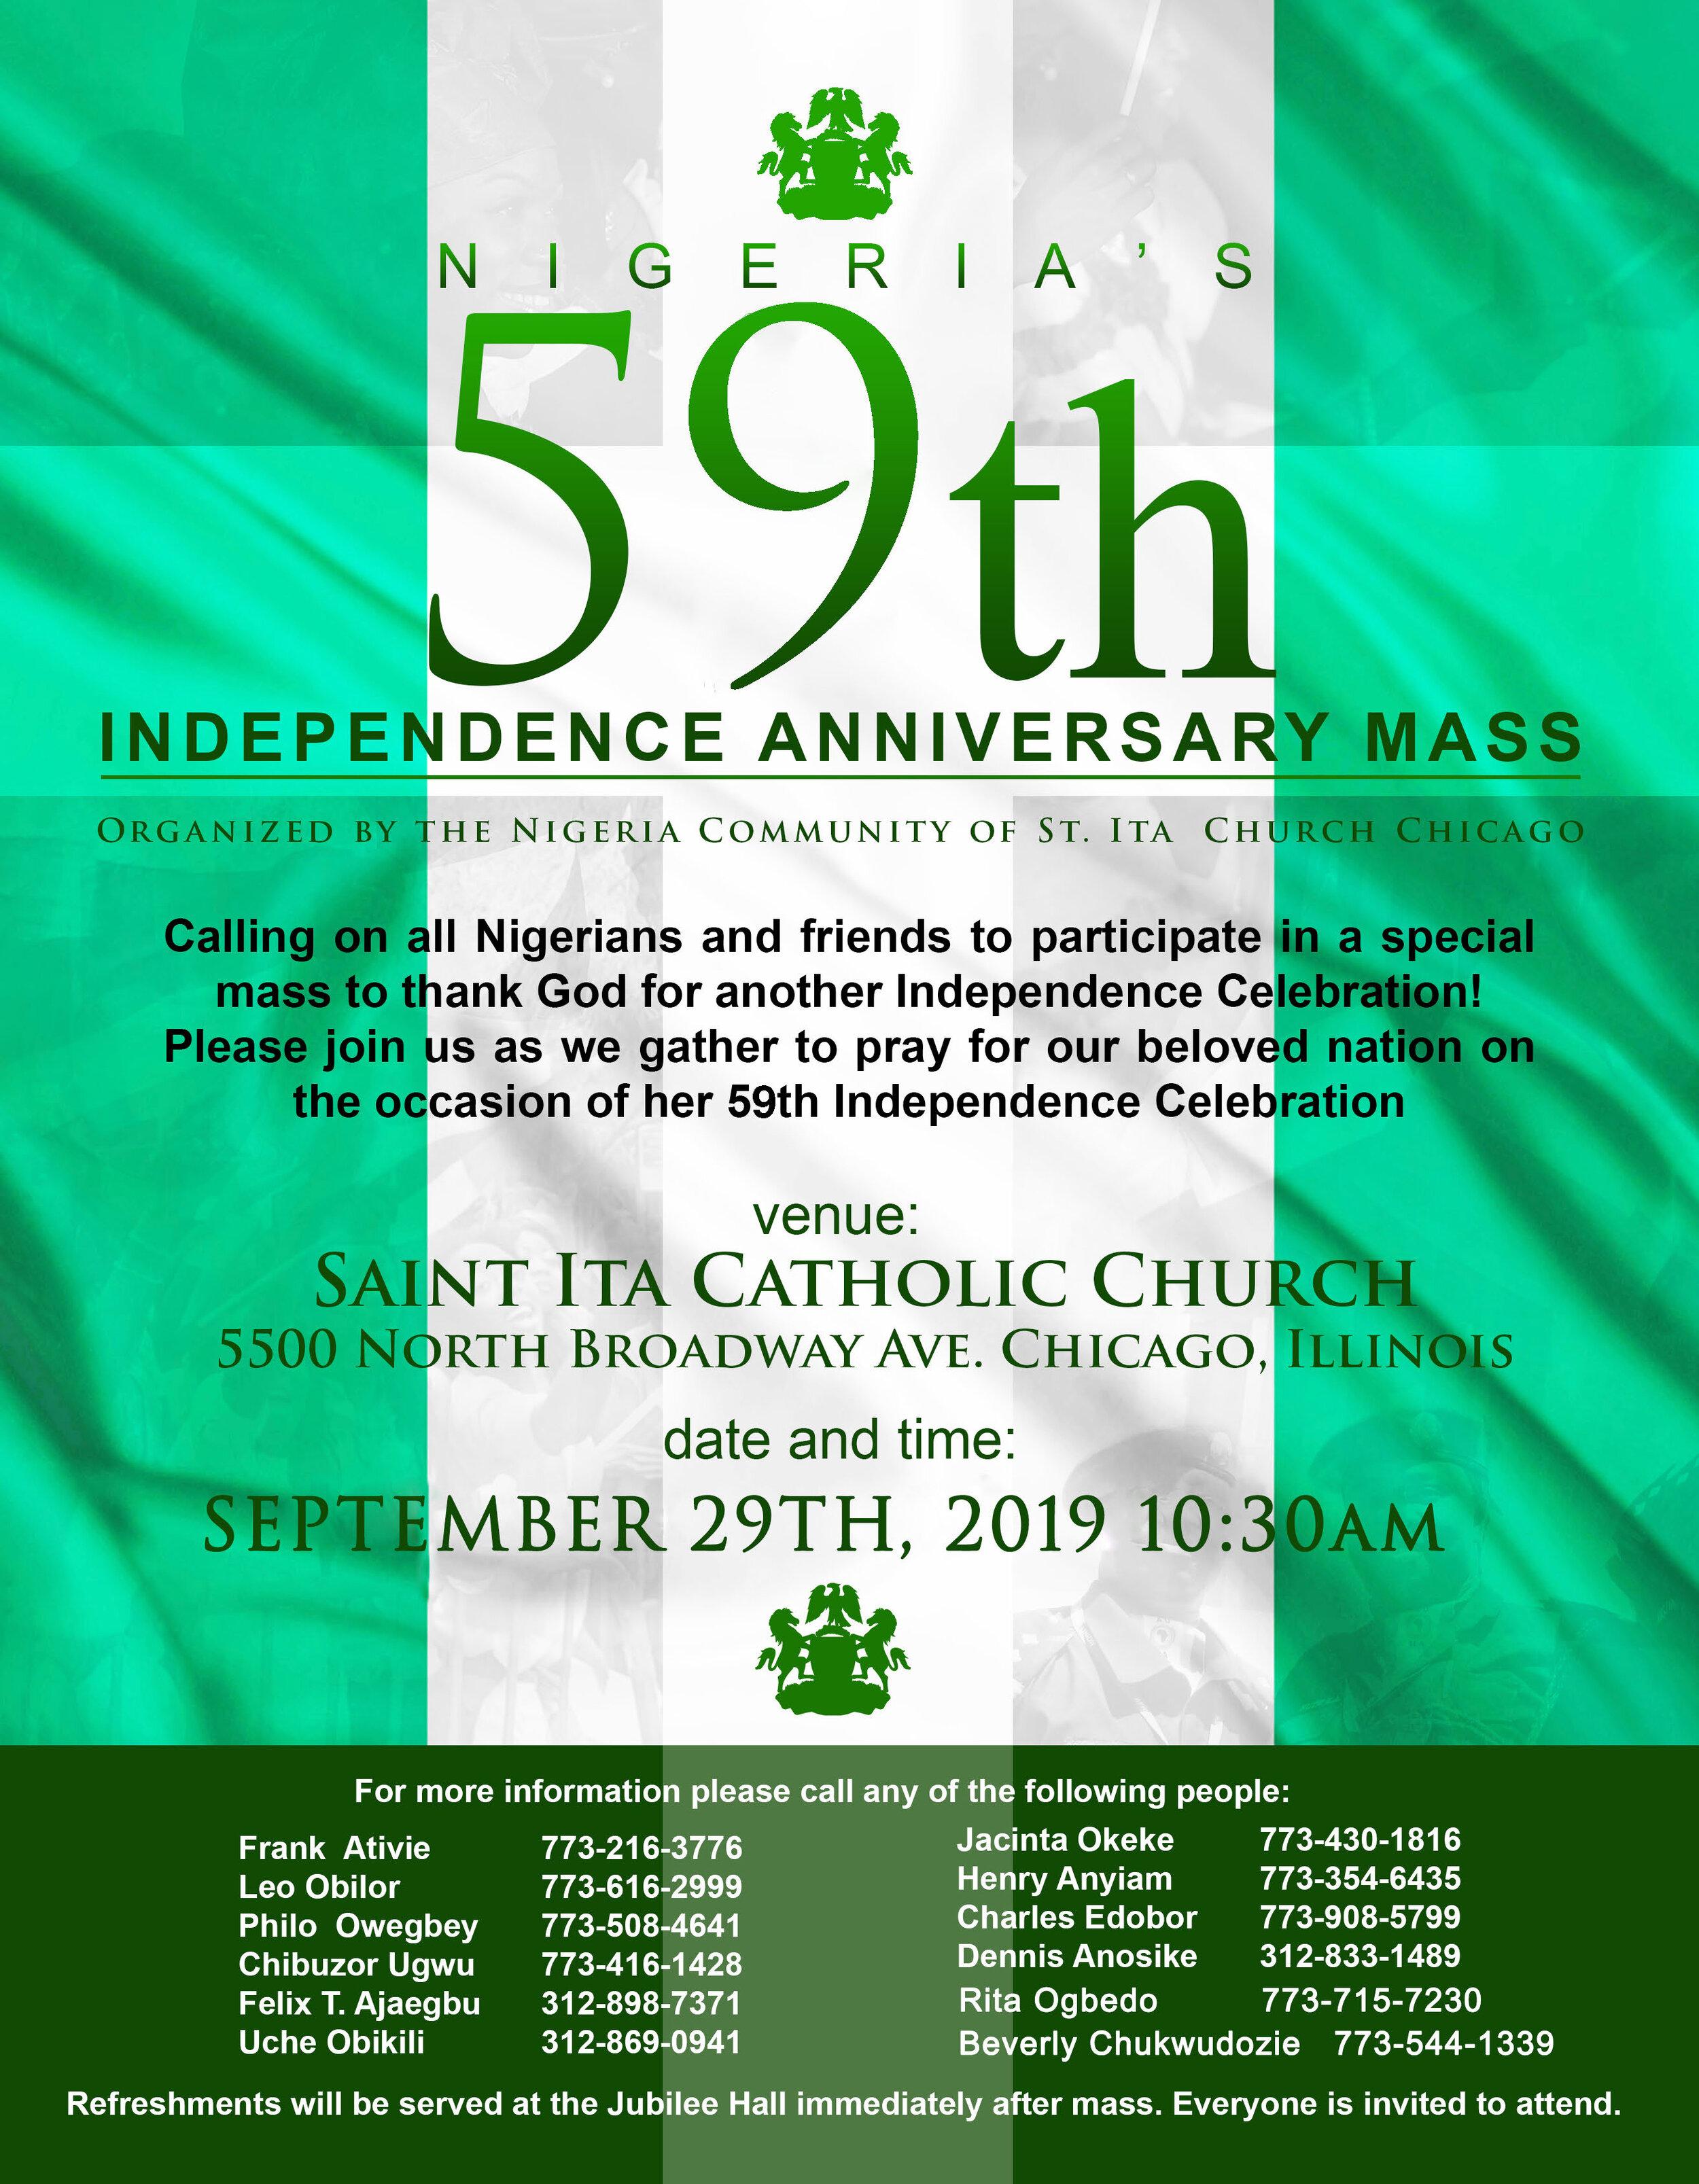 Nigerian Independence Day 2019.jpg